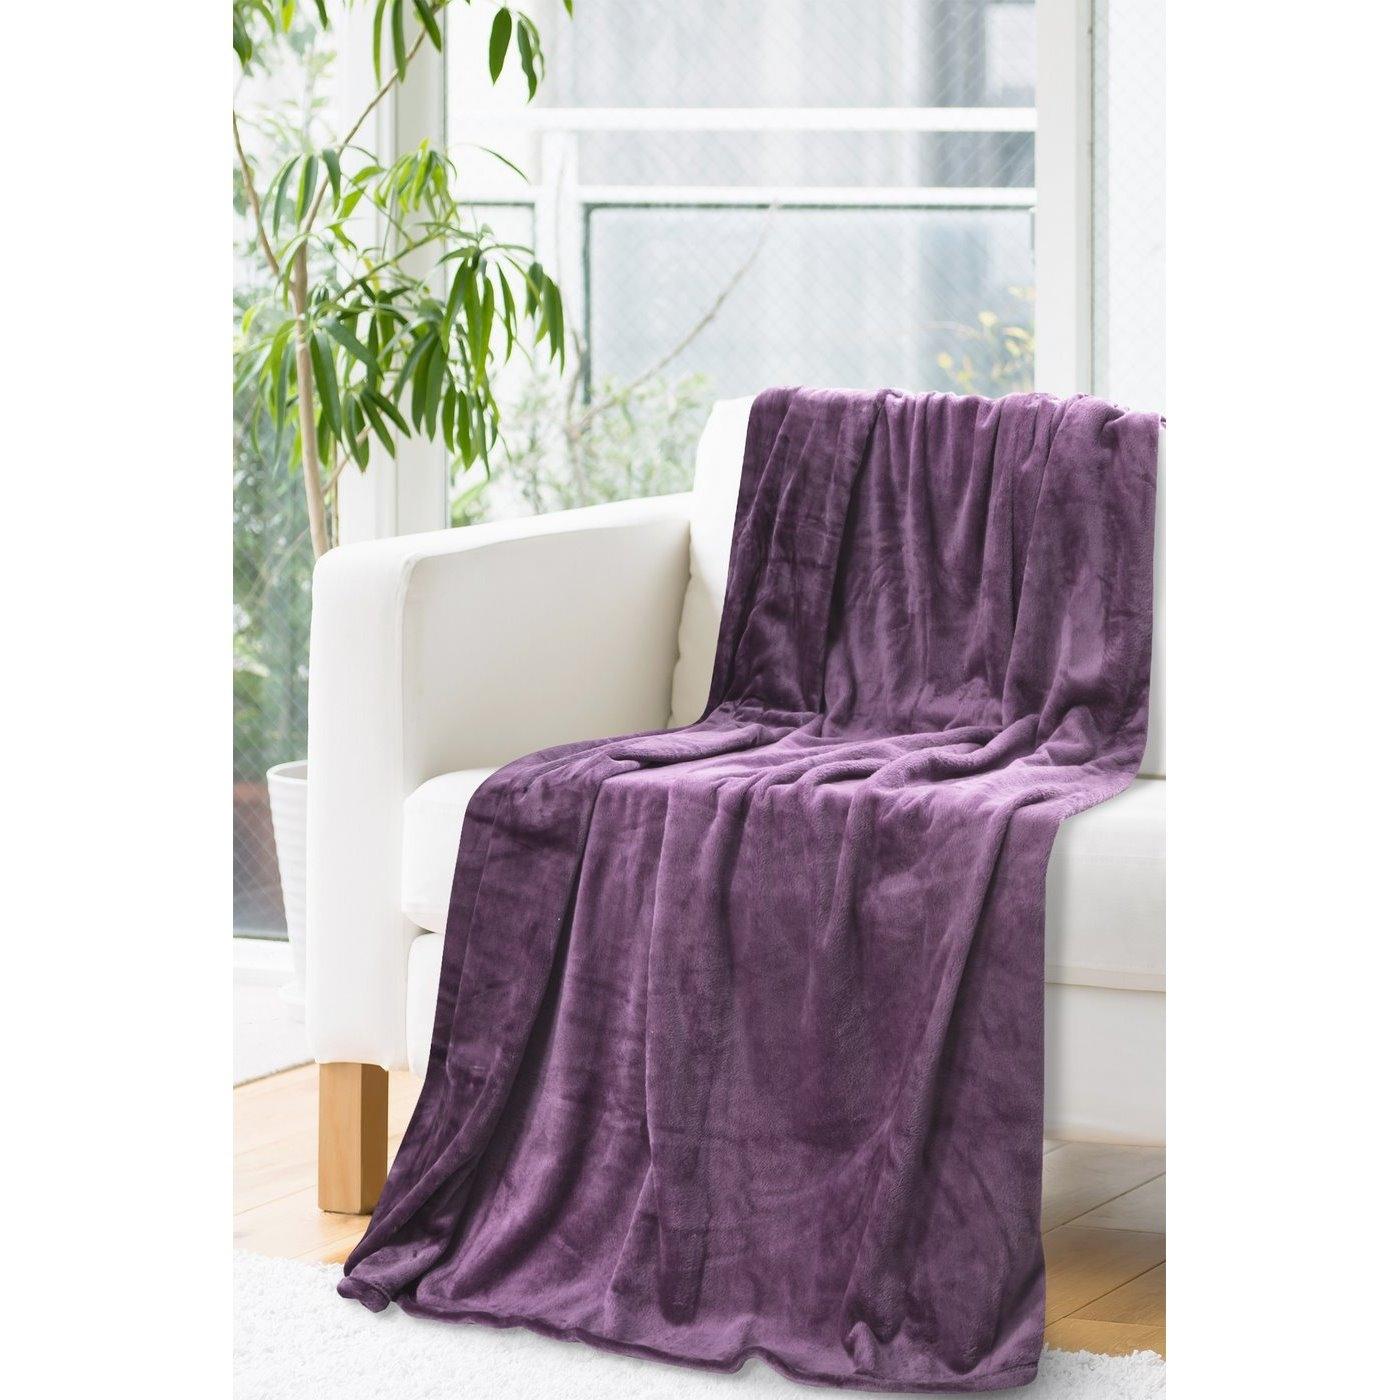 Patura Soft Purple 150 x 200 cm